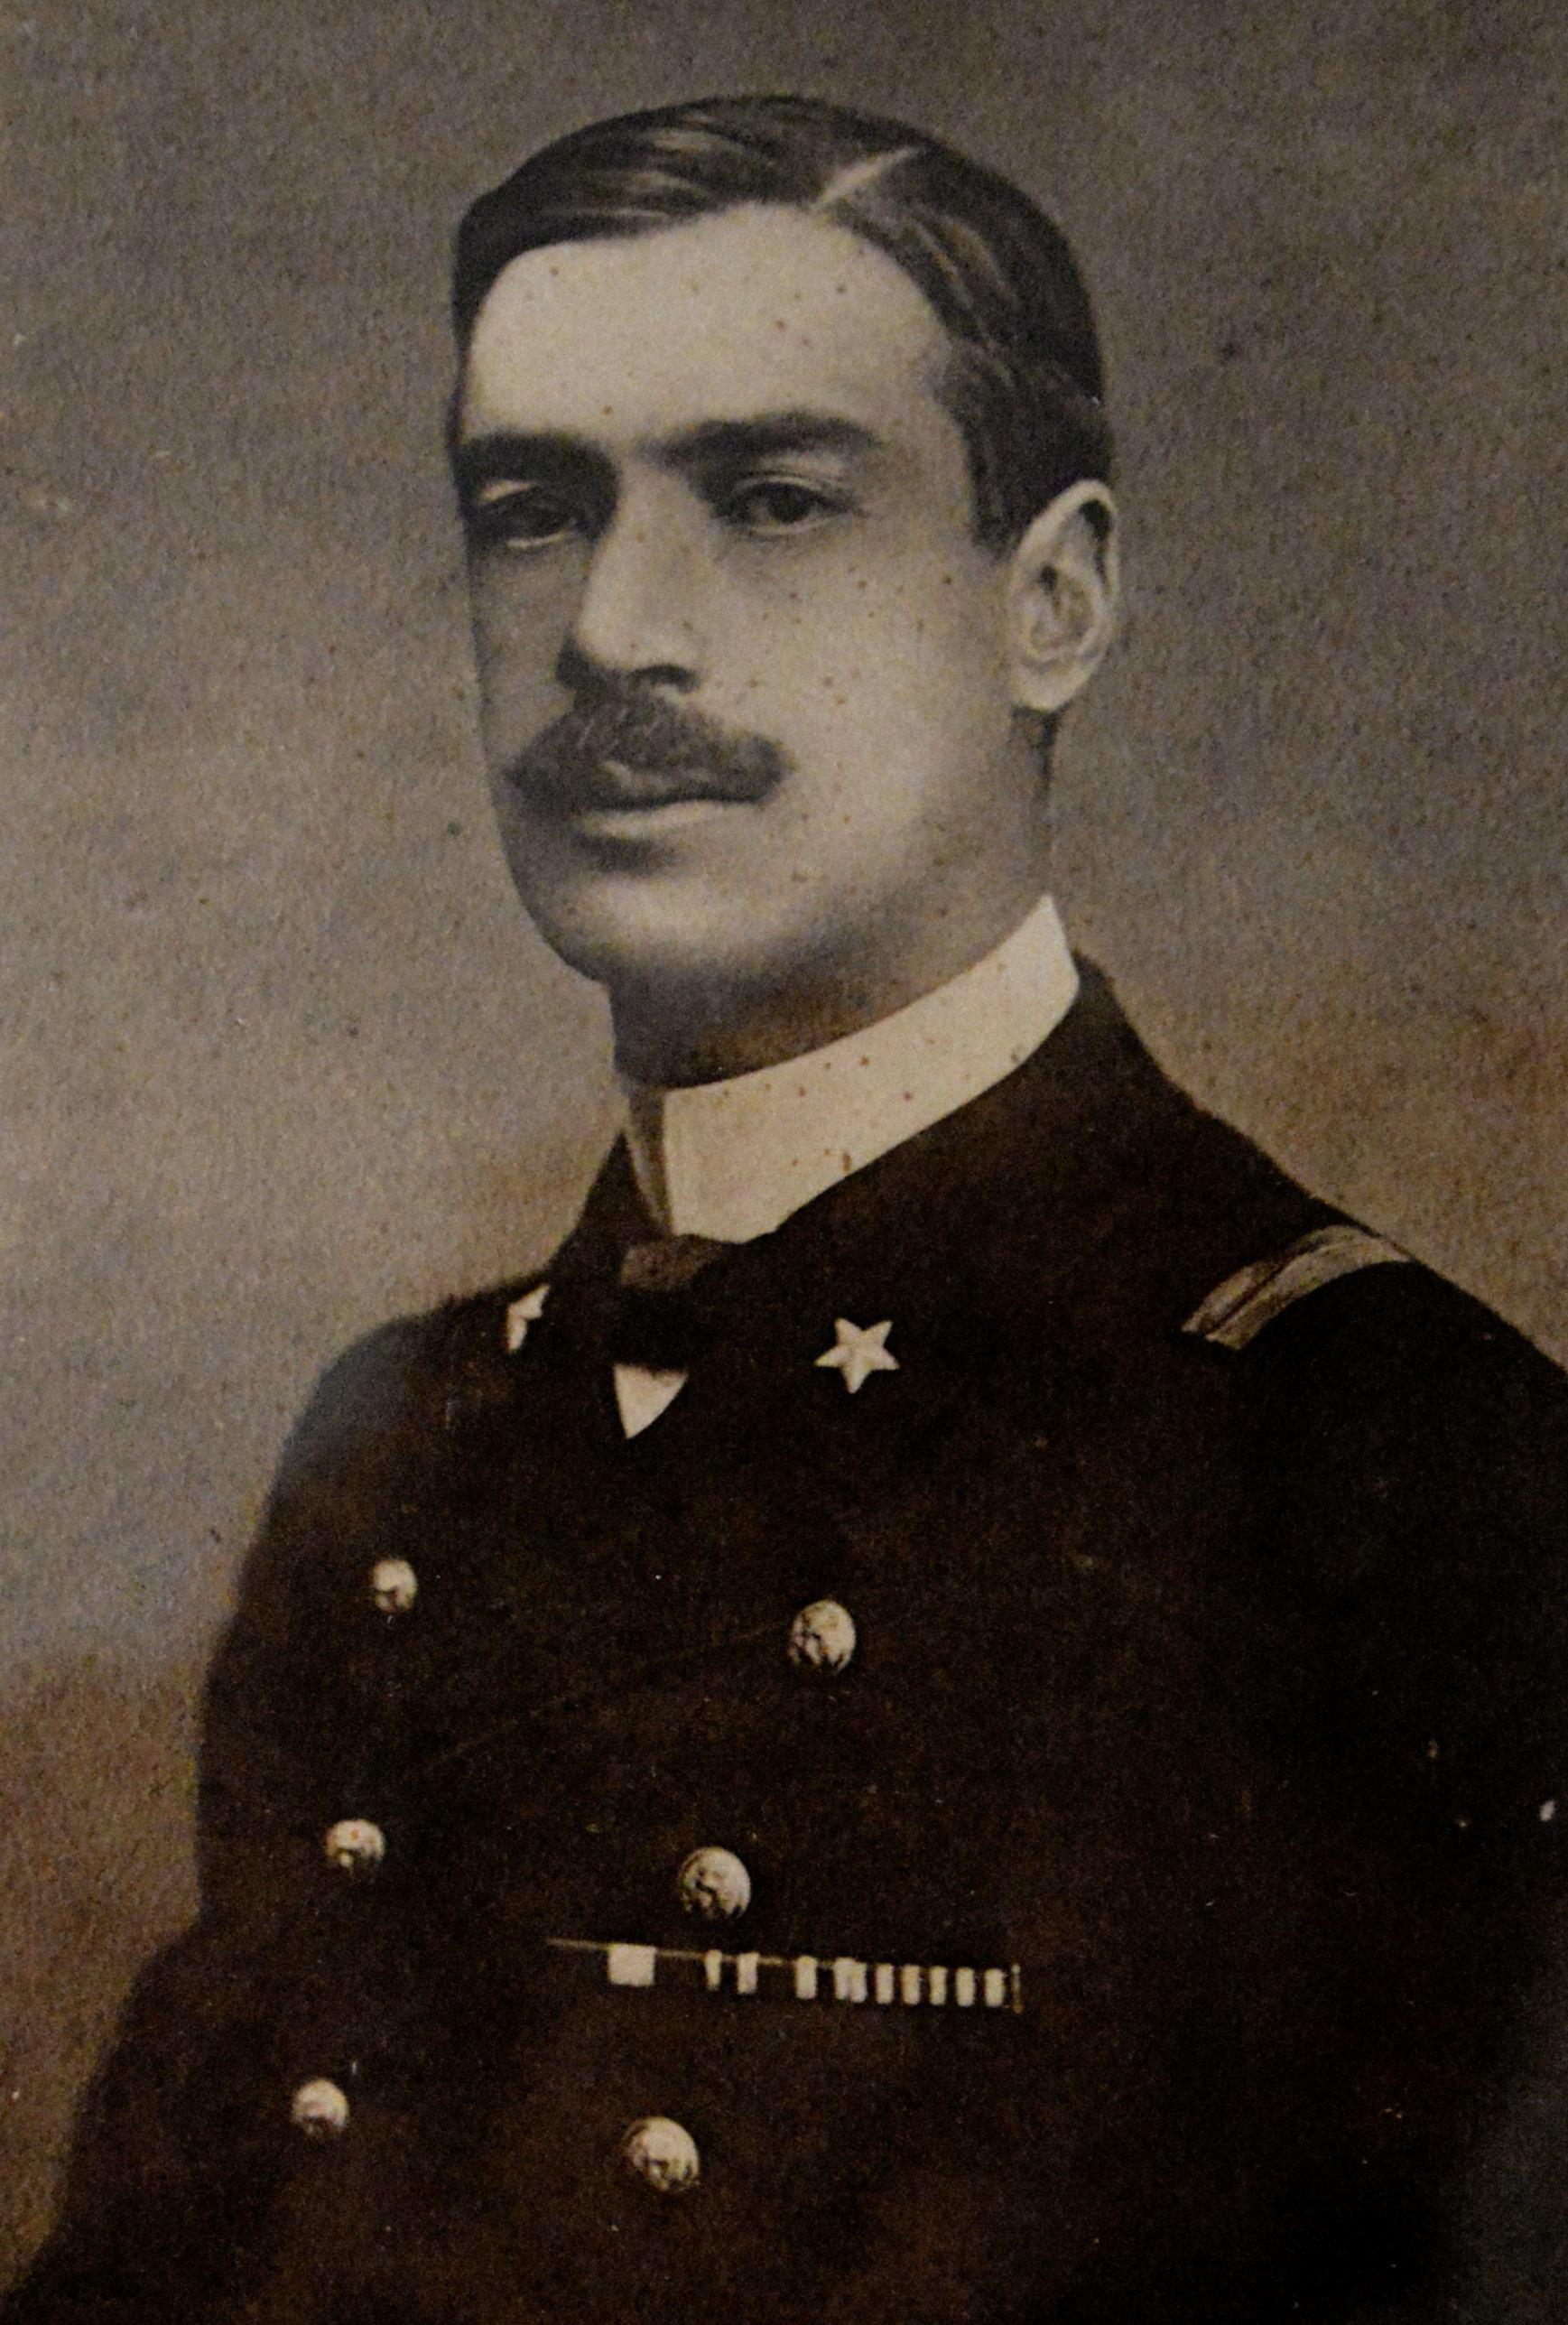 Tommaso Gulli